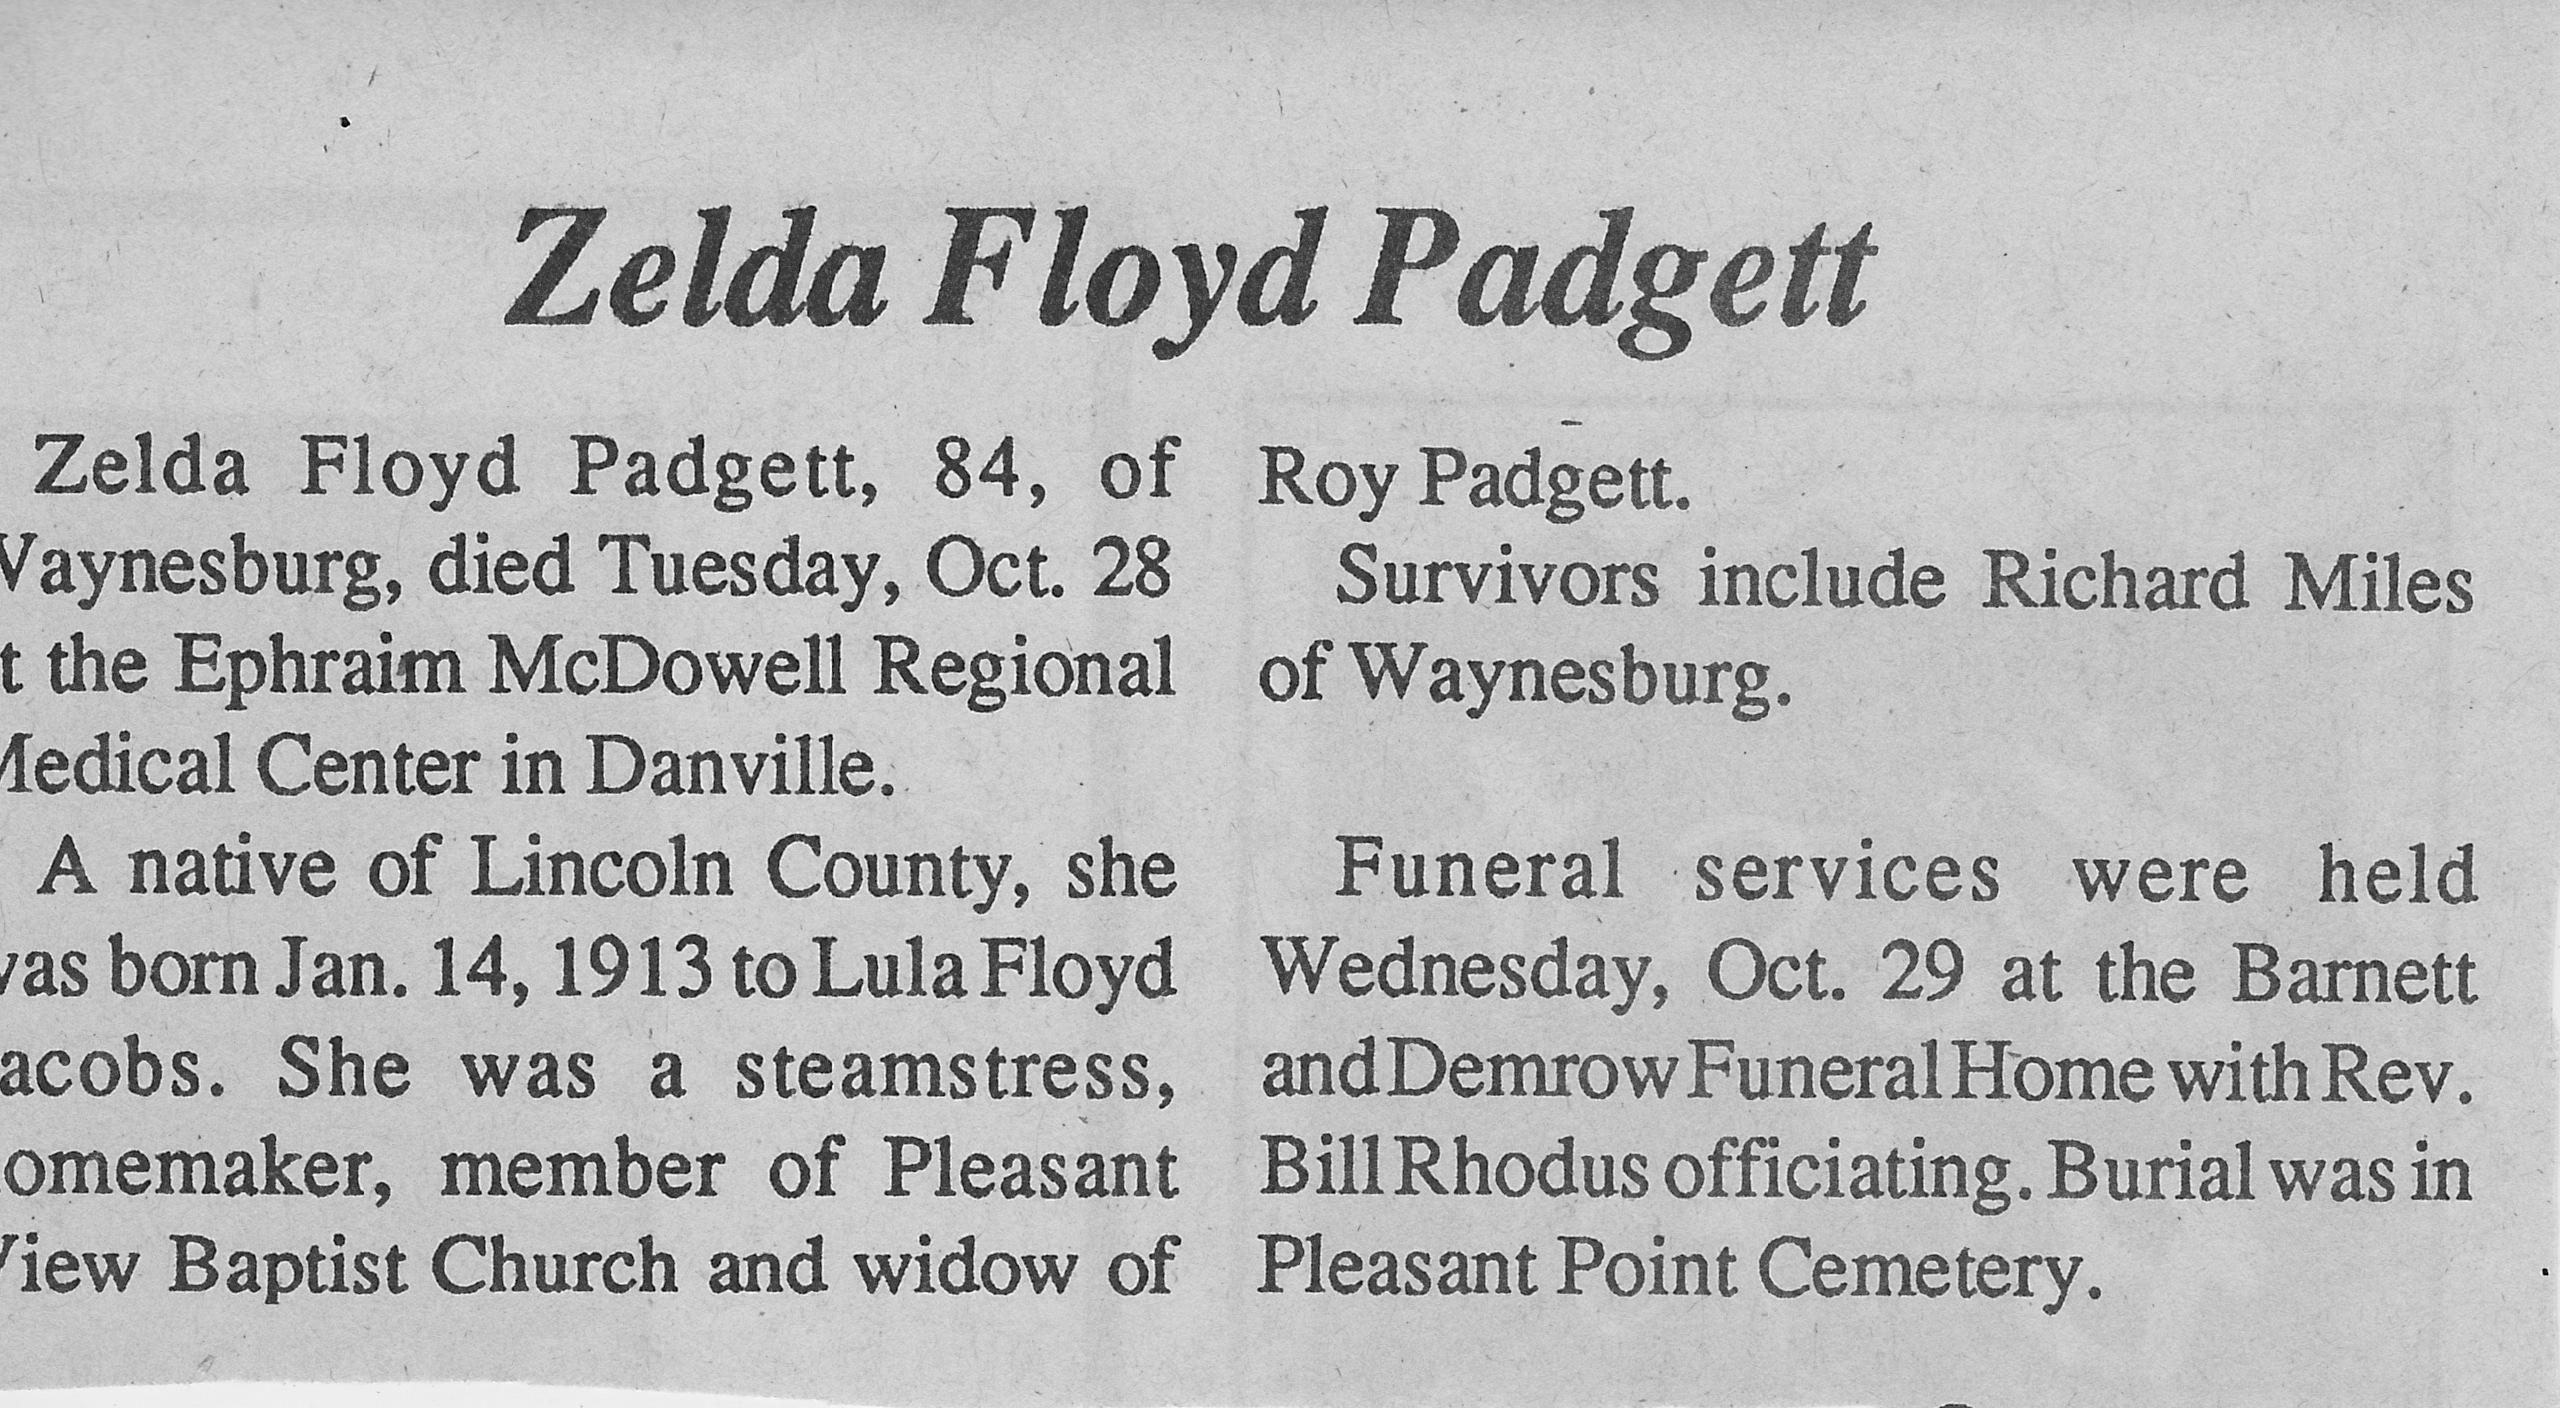 Zelda Floyd